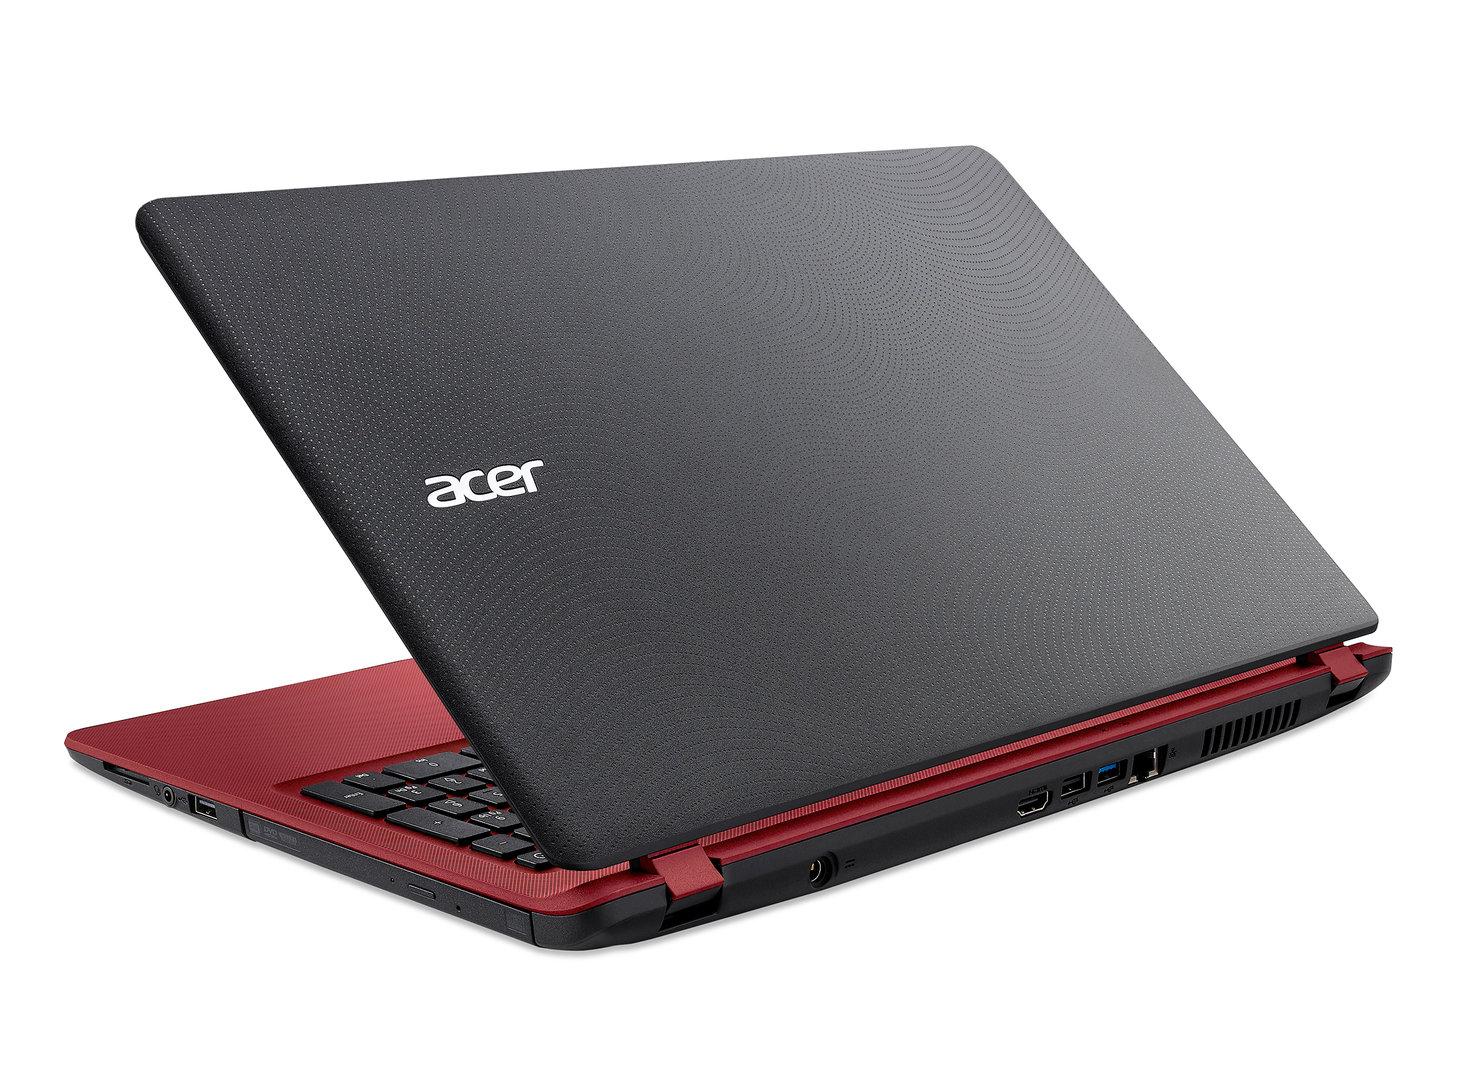 Acer Aspire ES 15 Red